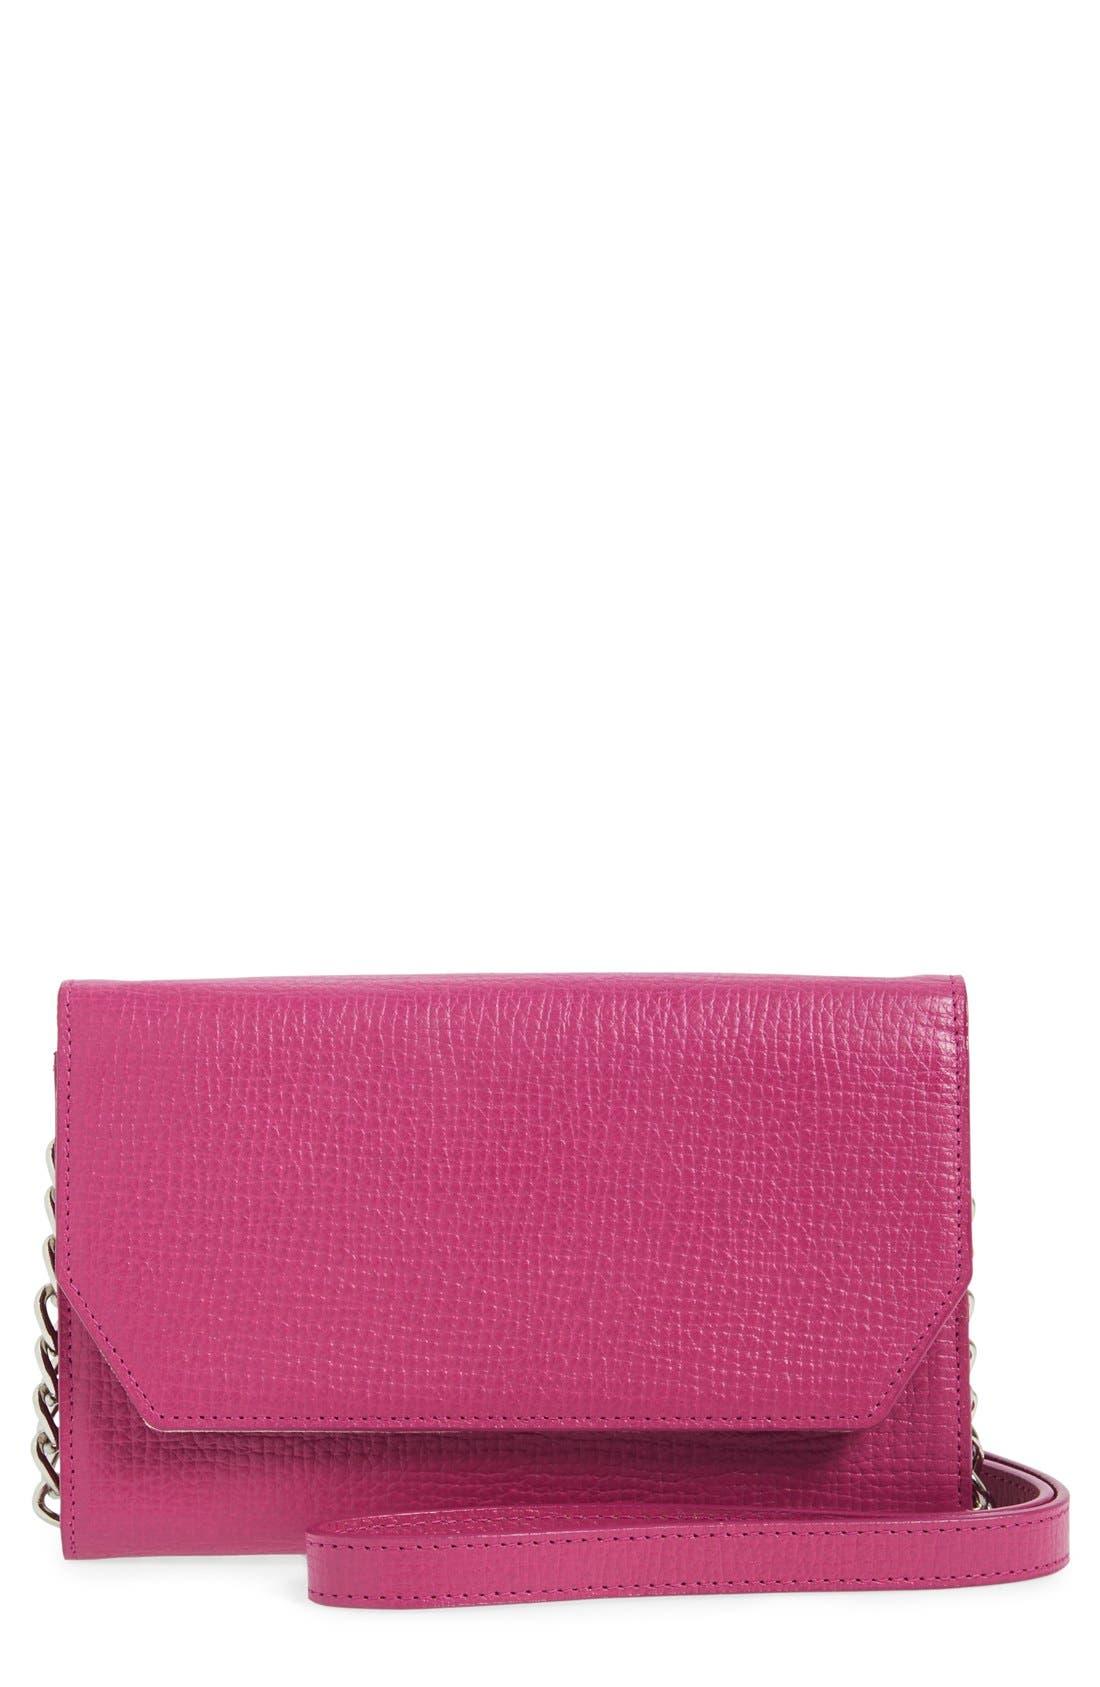 Main Image - Halogen Leather Crossbody Bag